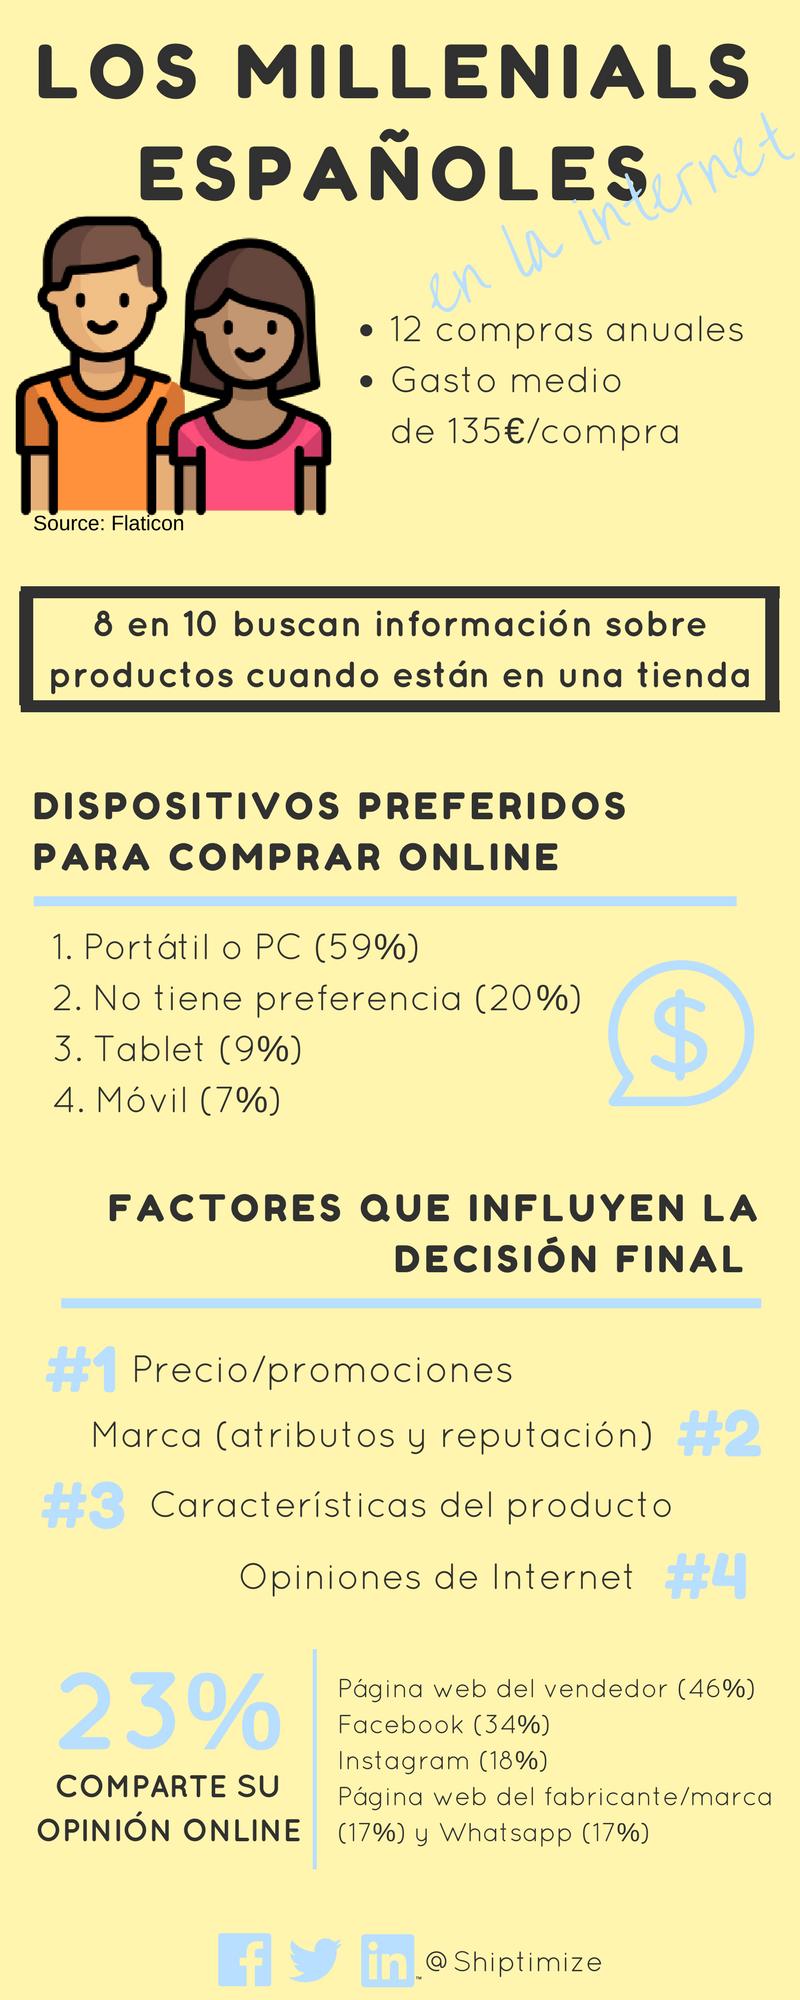 Millenials españoles en Internet